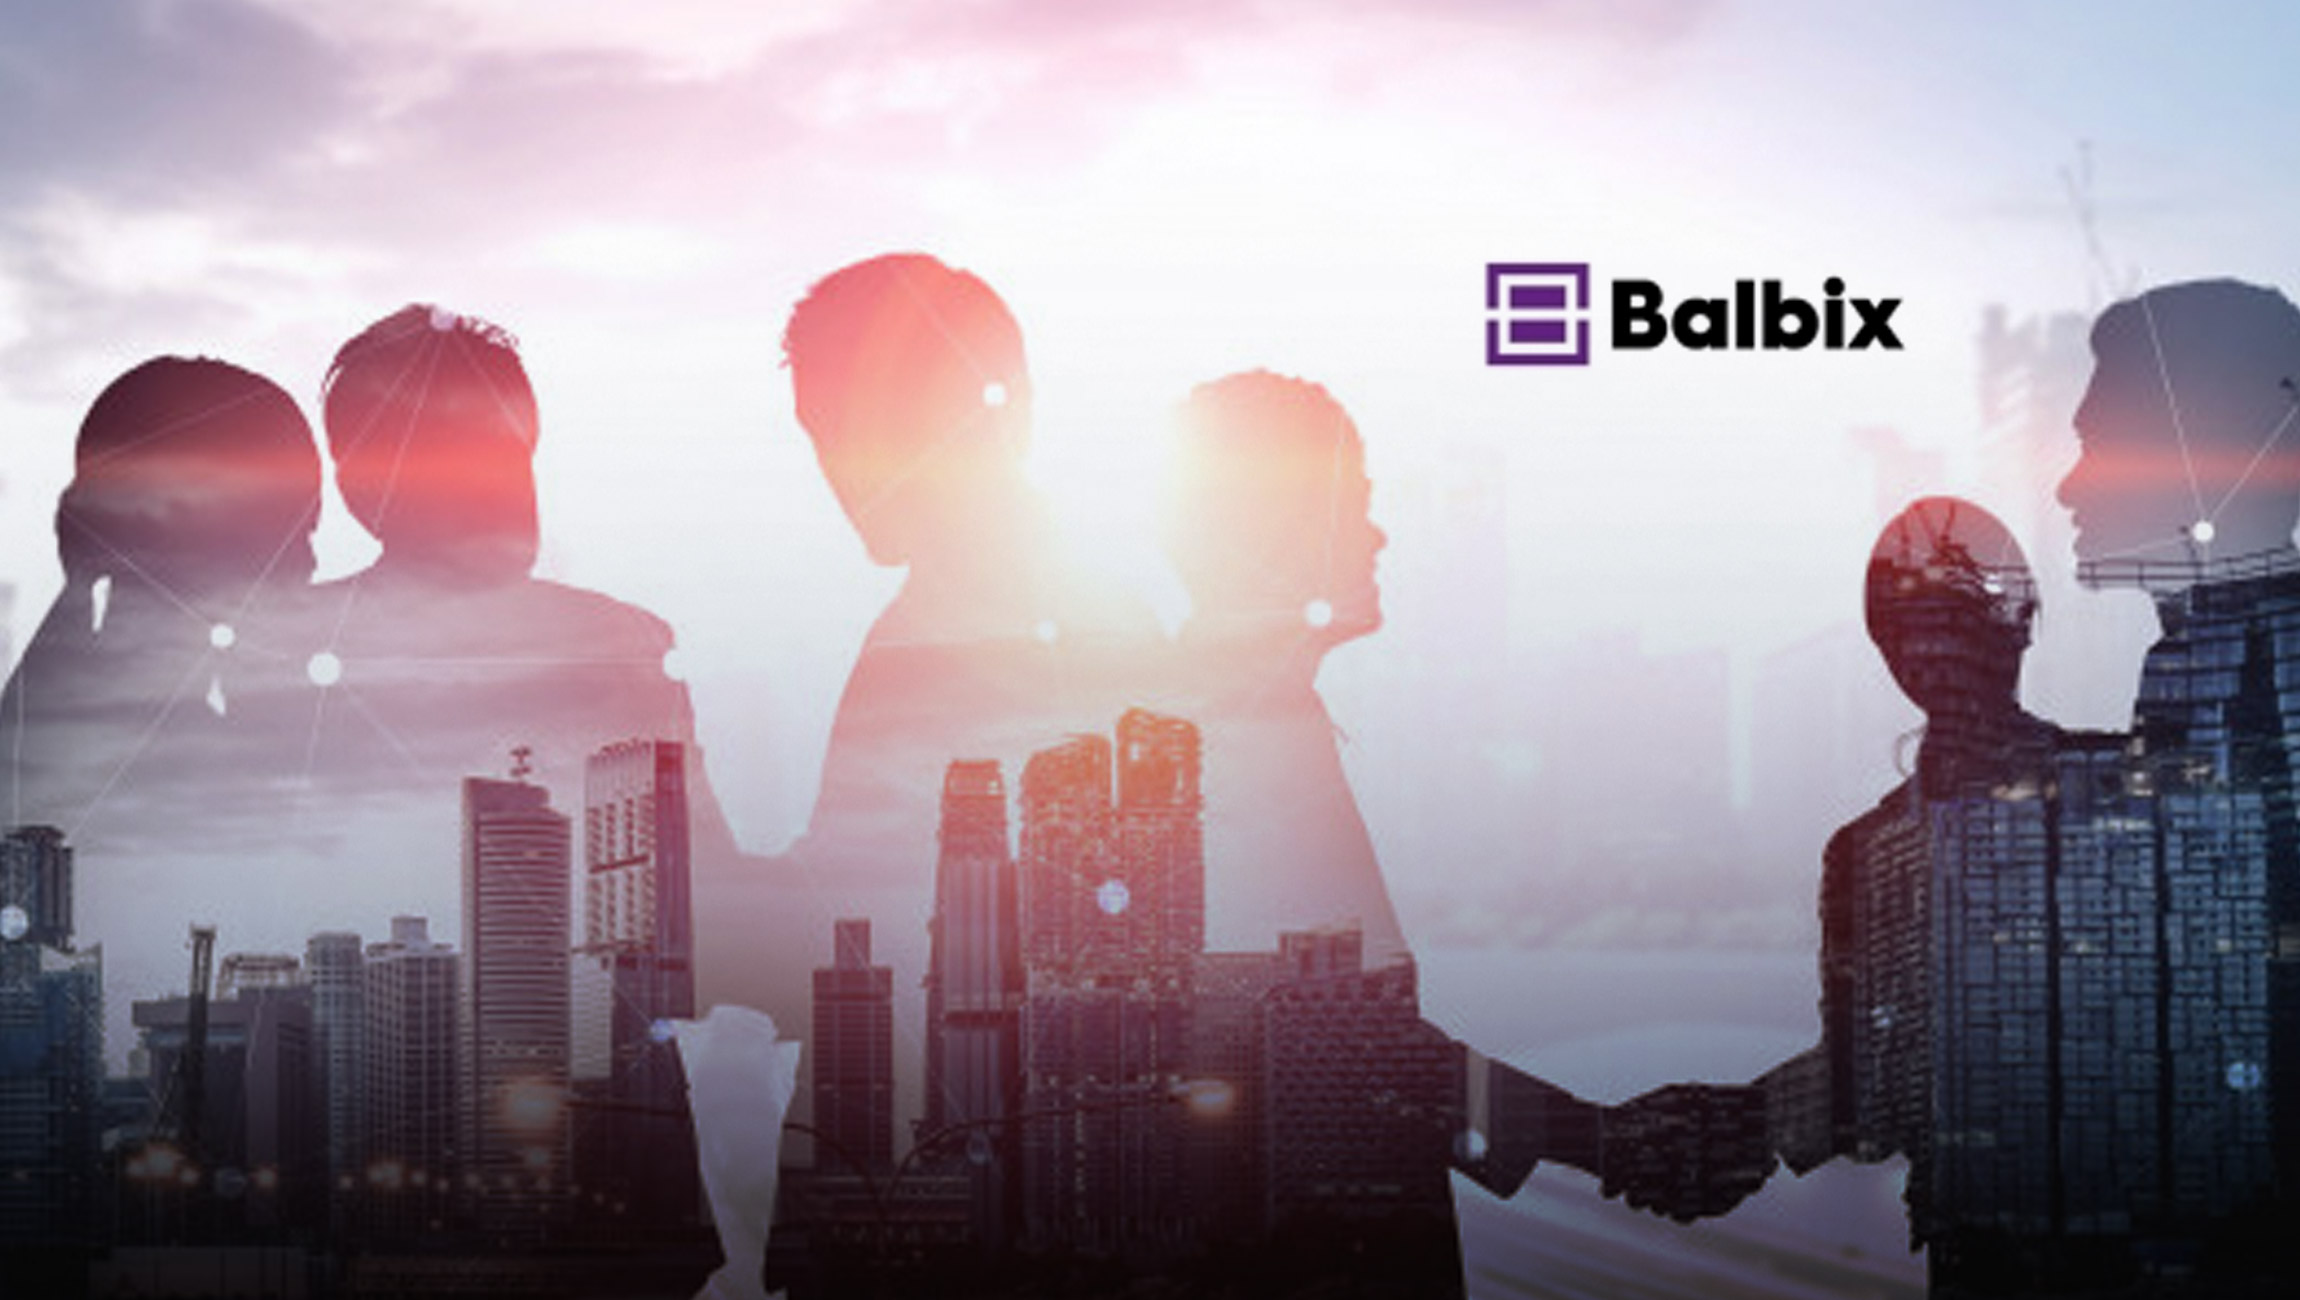 Balbix Wins 2020 CyberSecurity Breakthrough Awards